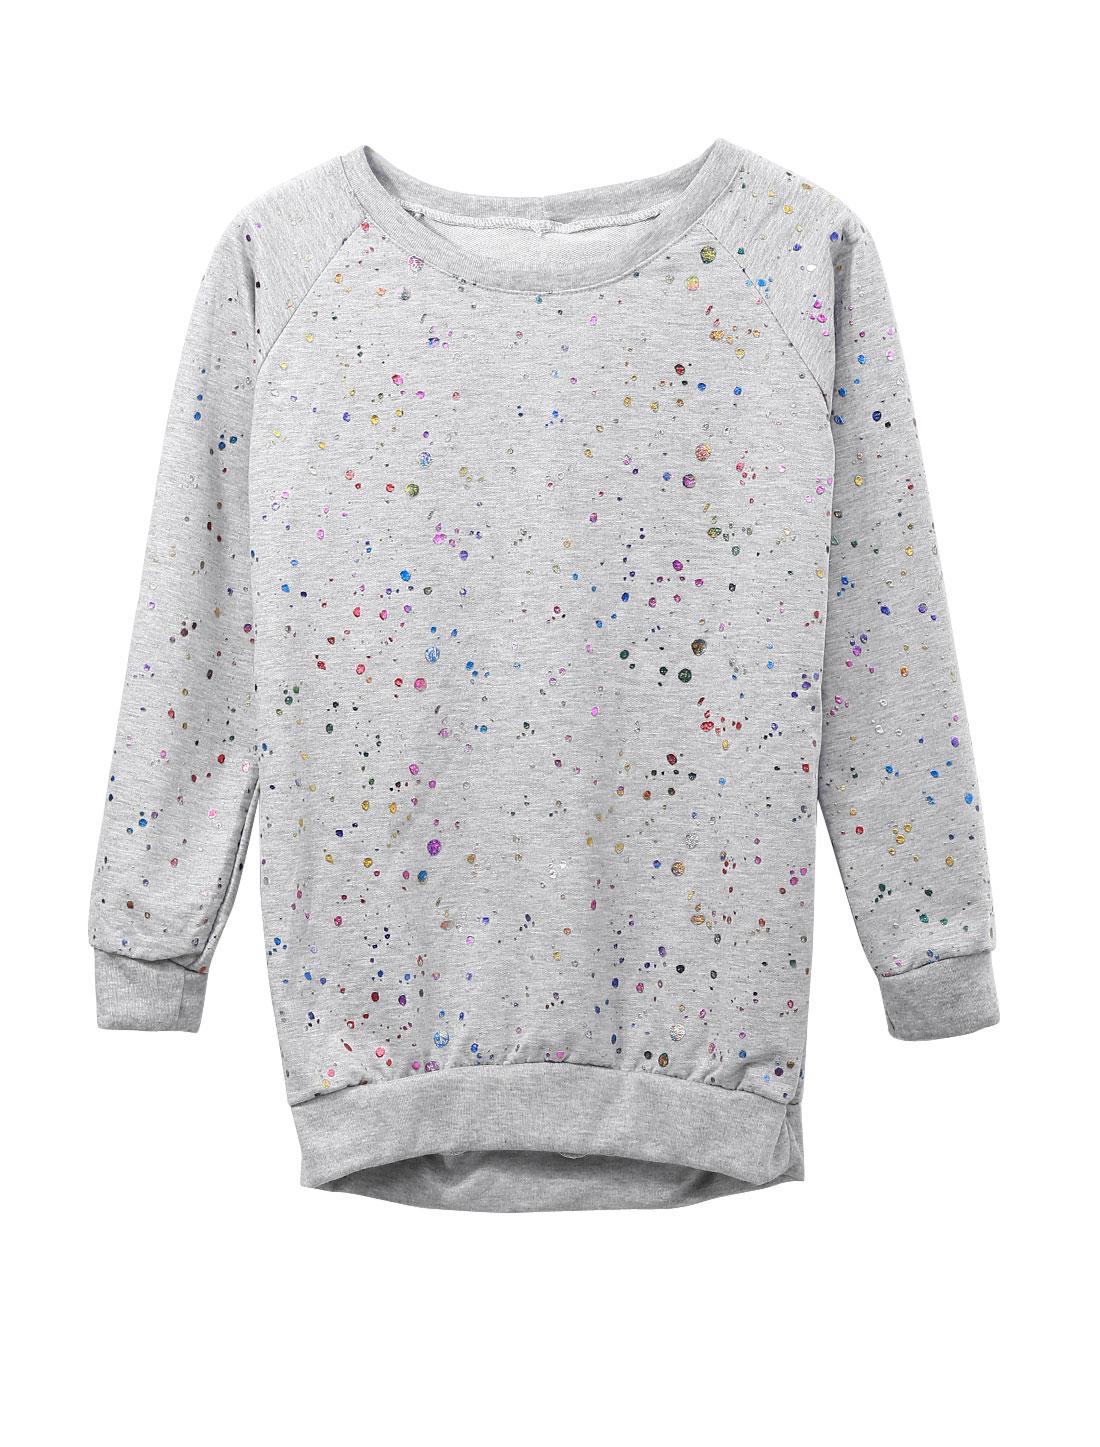 Lady Slipover Dots Prints Ribbed Hem Leisure Sweatshirt Light Gray XS